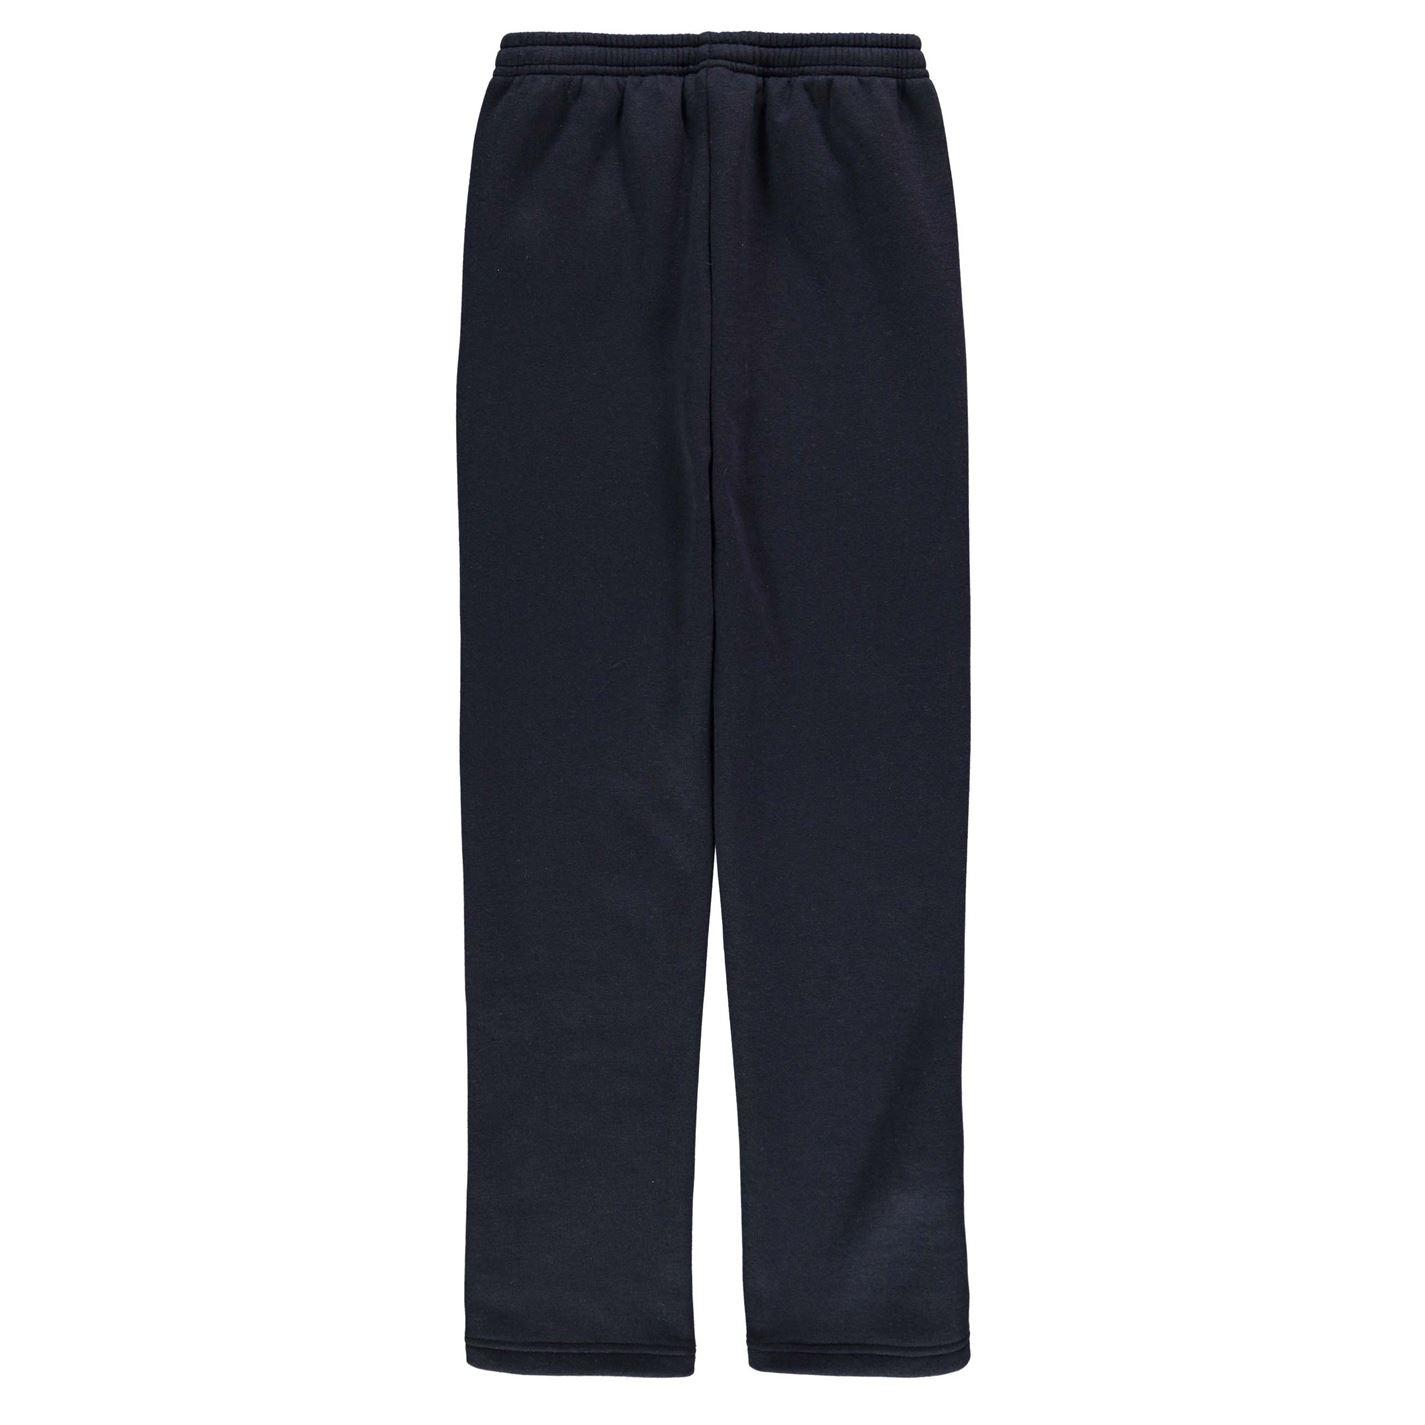 ad0543299391 Slazenger Kids Boys Open Hem Fleece Pants Junior Jogging Bottoms ...